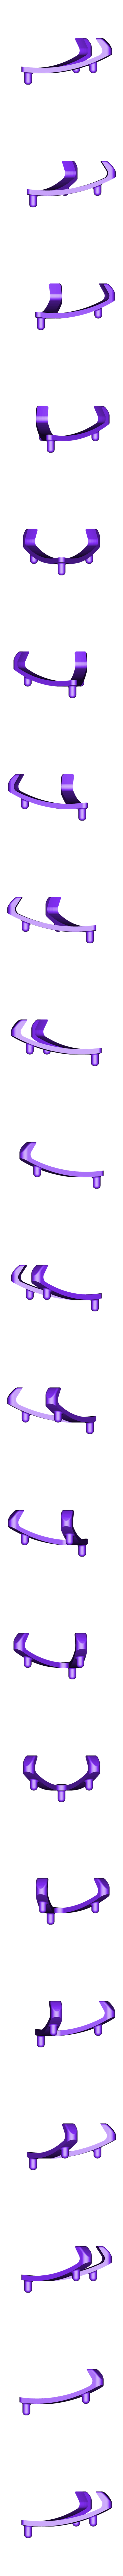 capsule_stand.stl Download free STL file Orion Capsule • 3D printable design, spac3D